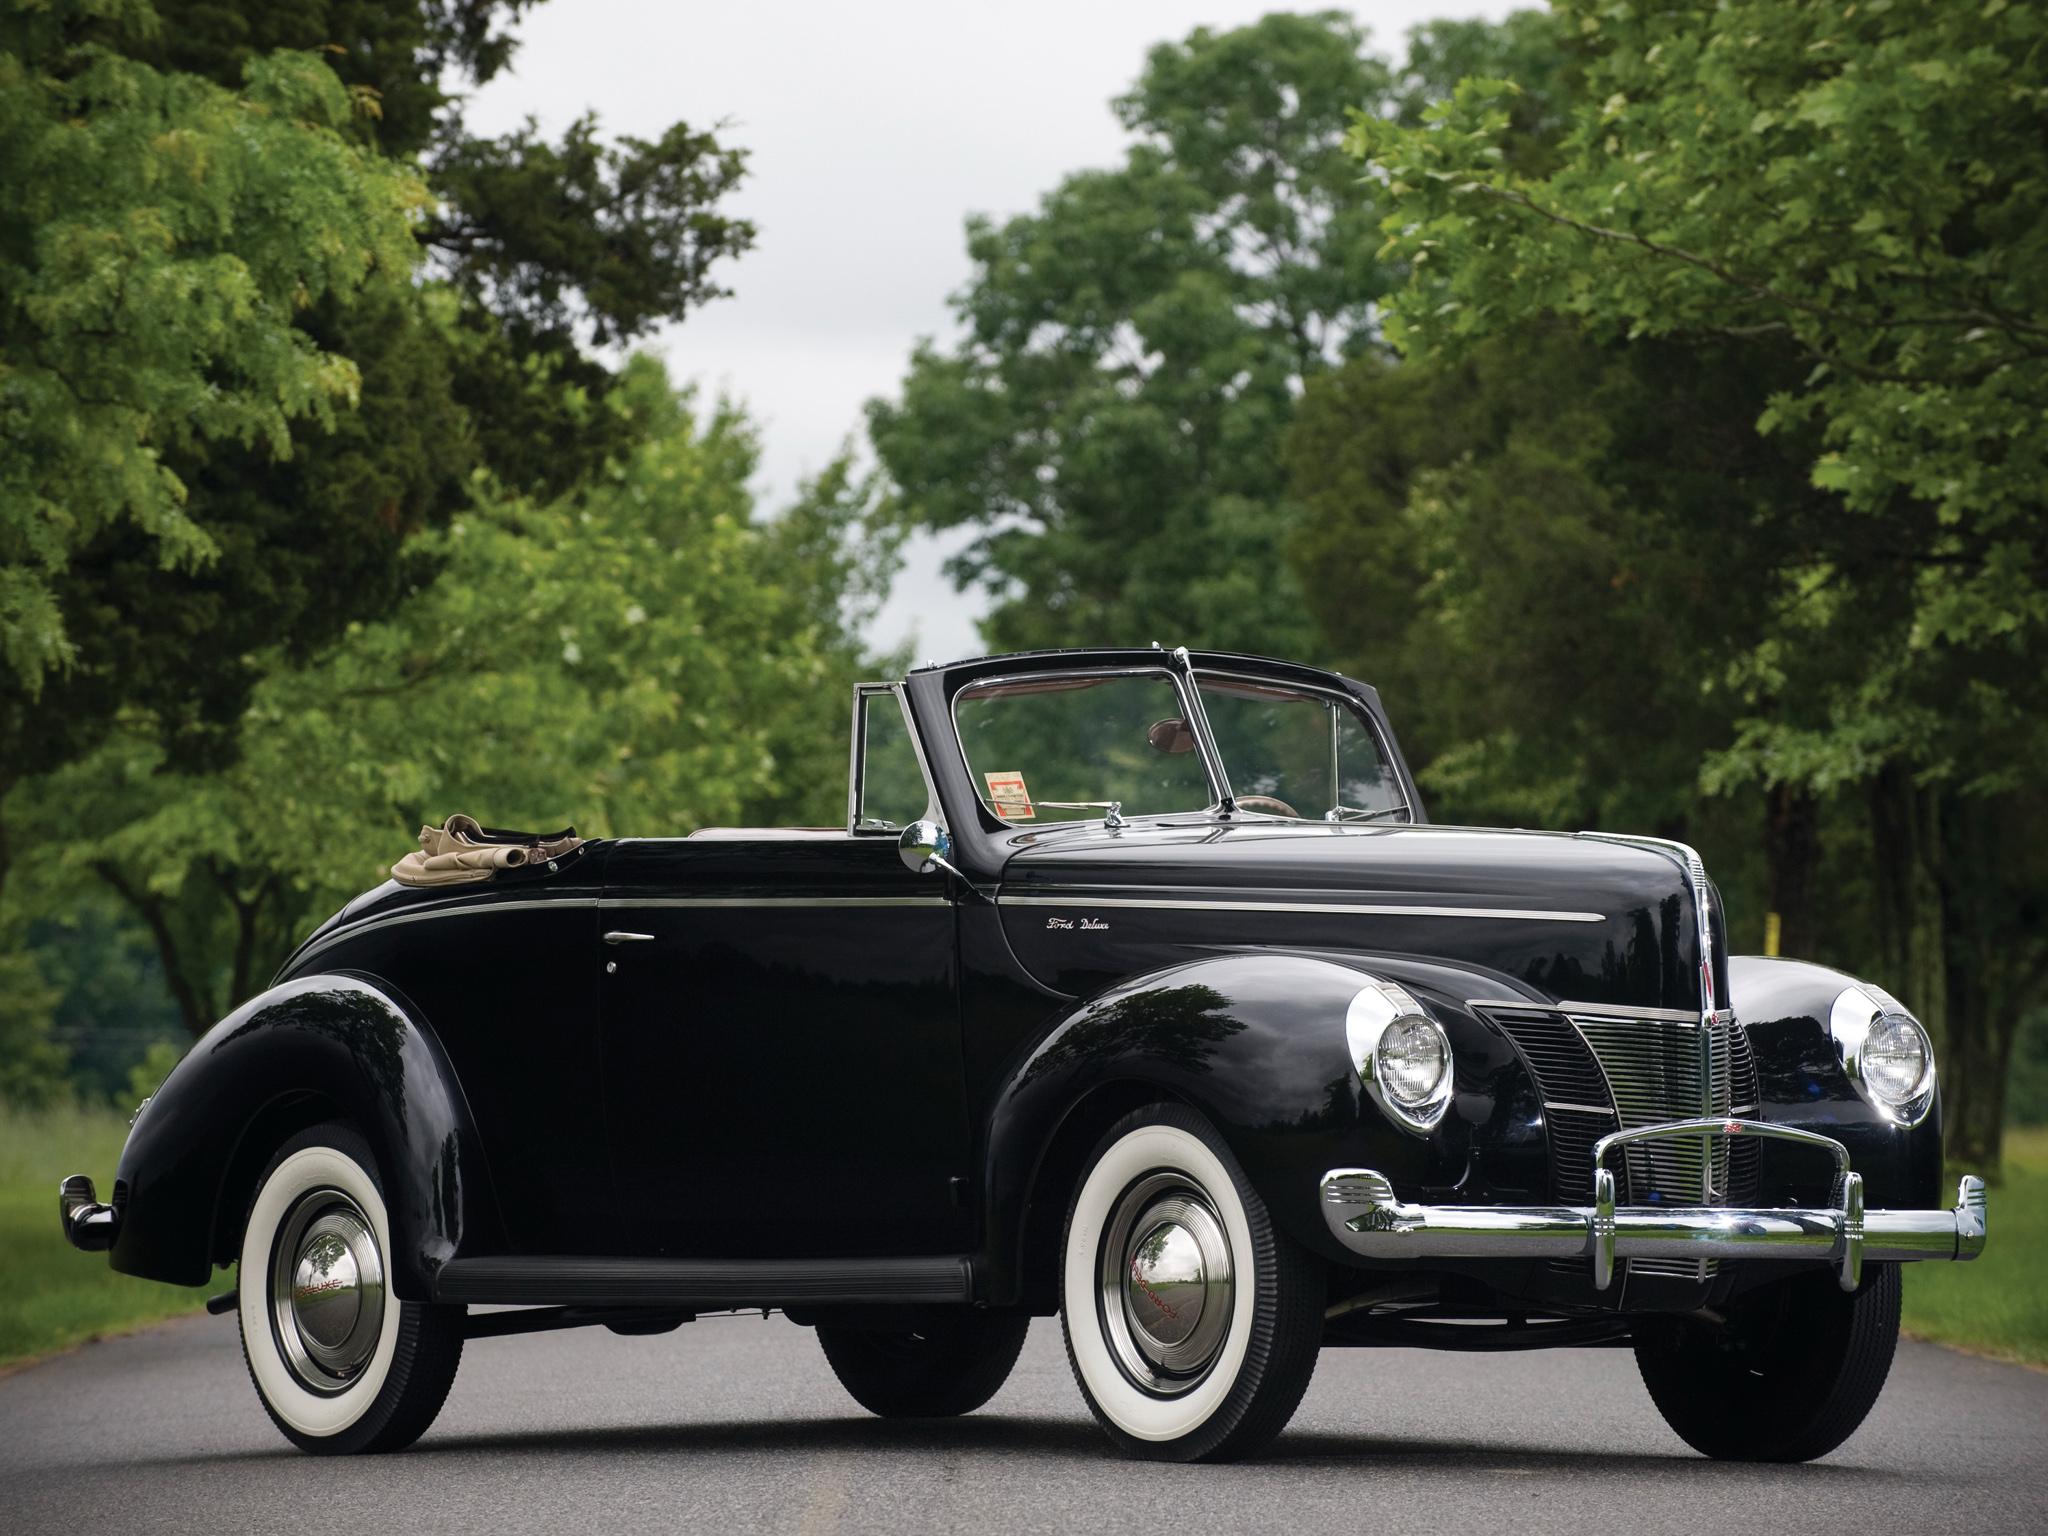 Classic Car Wallpaper And Screensavers